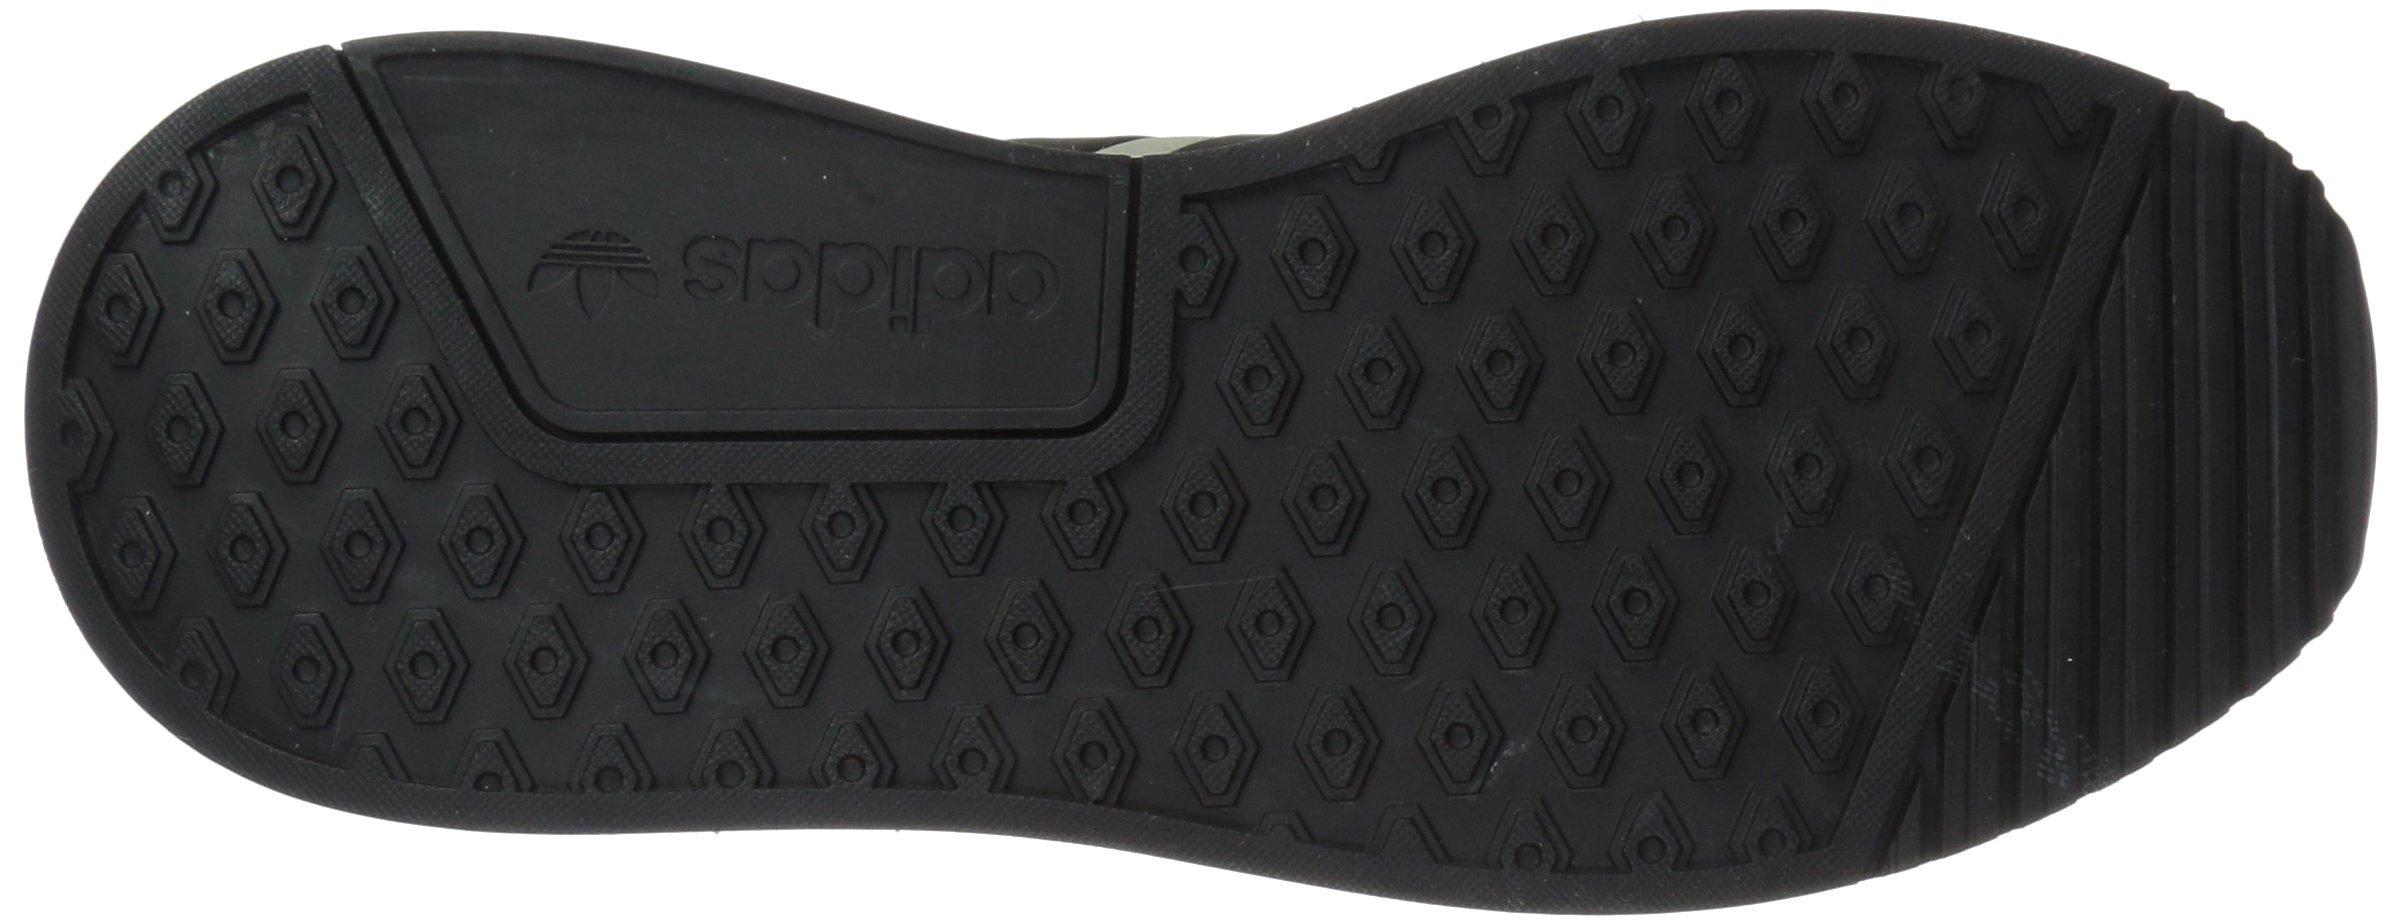 adidas Originals Mens X_PLR Running Shoe Sneaker Black/Sesame, 4.5 M US by adidas Originals (Image #3)